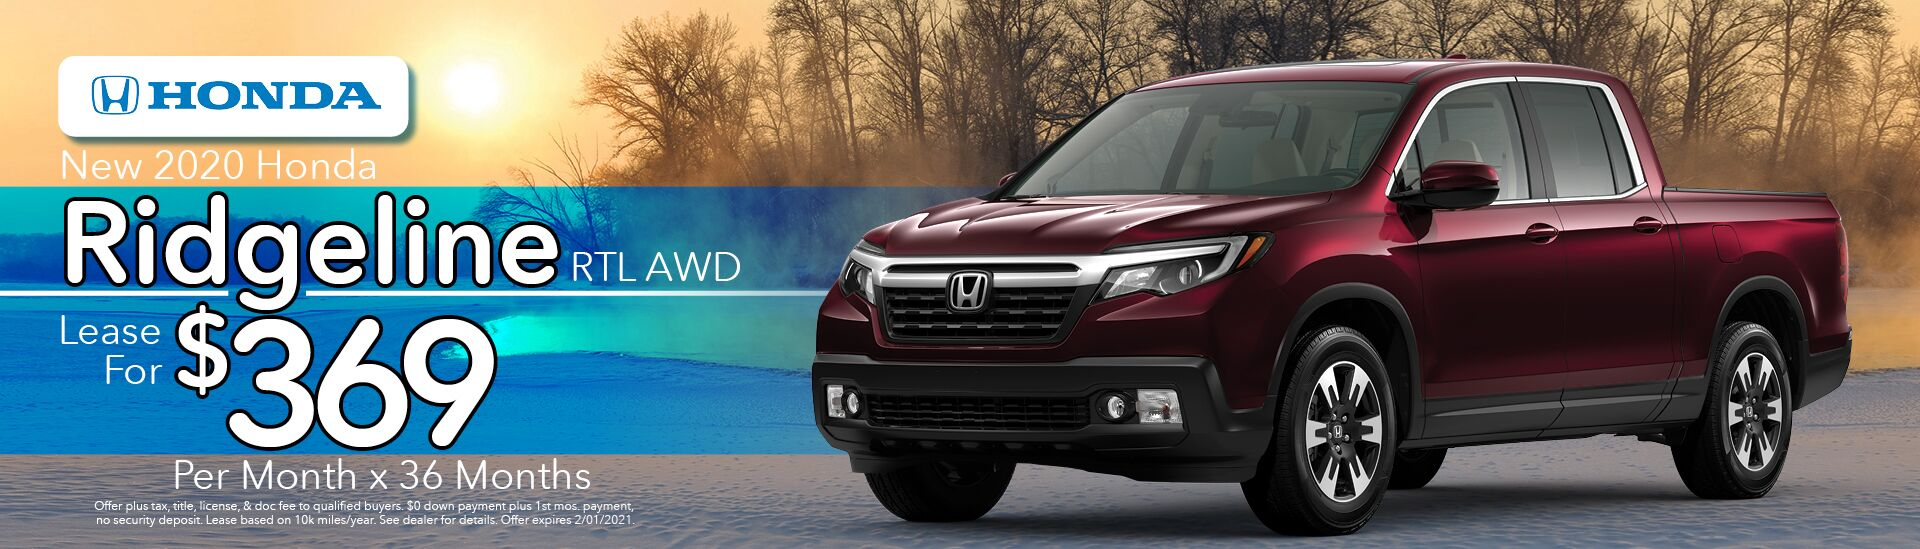 2020 Honda Ridgeline ATL